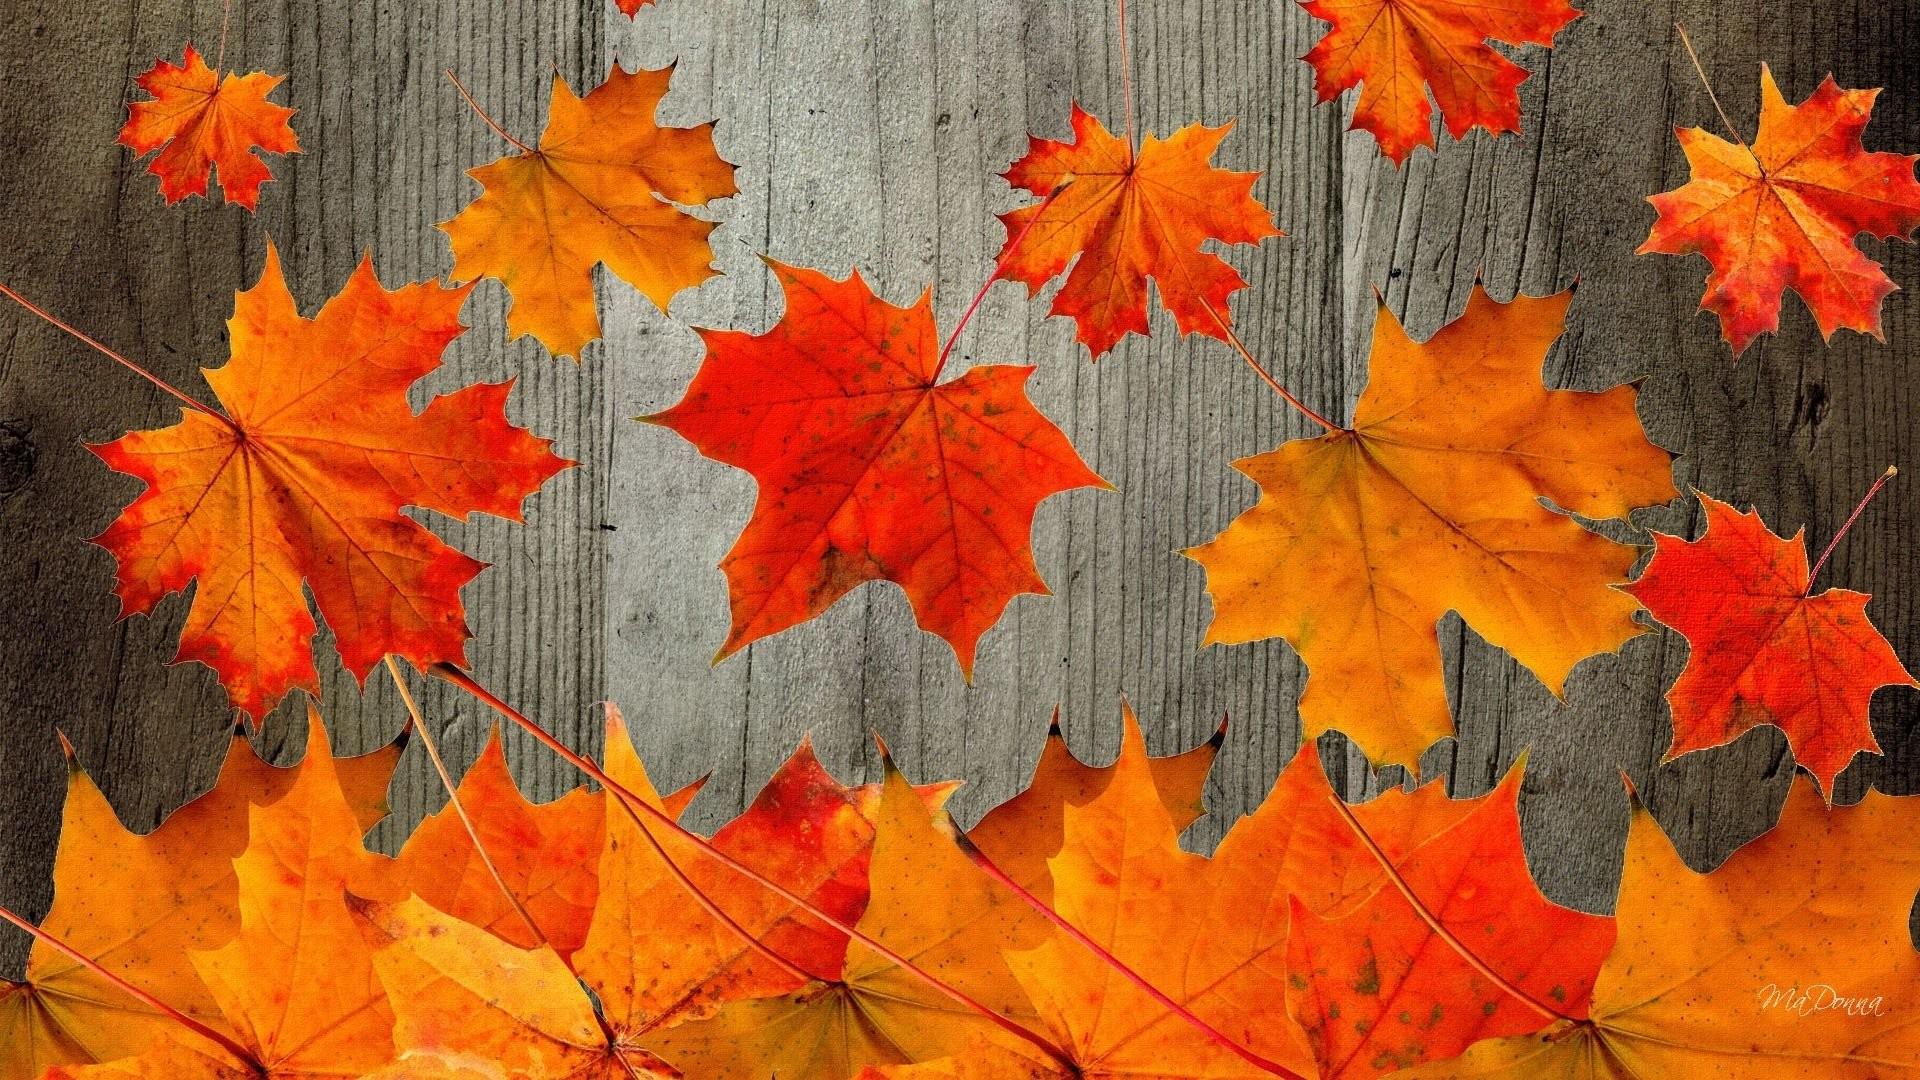 Fall Tree Desktop Wallpaper Fall Wallpaper For Desktop 1920x1080 60 Images